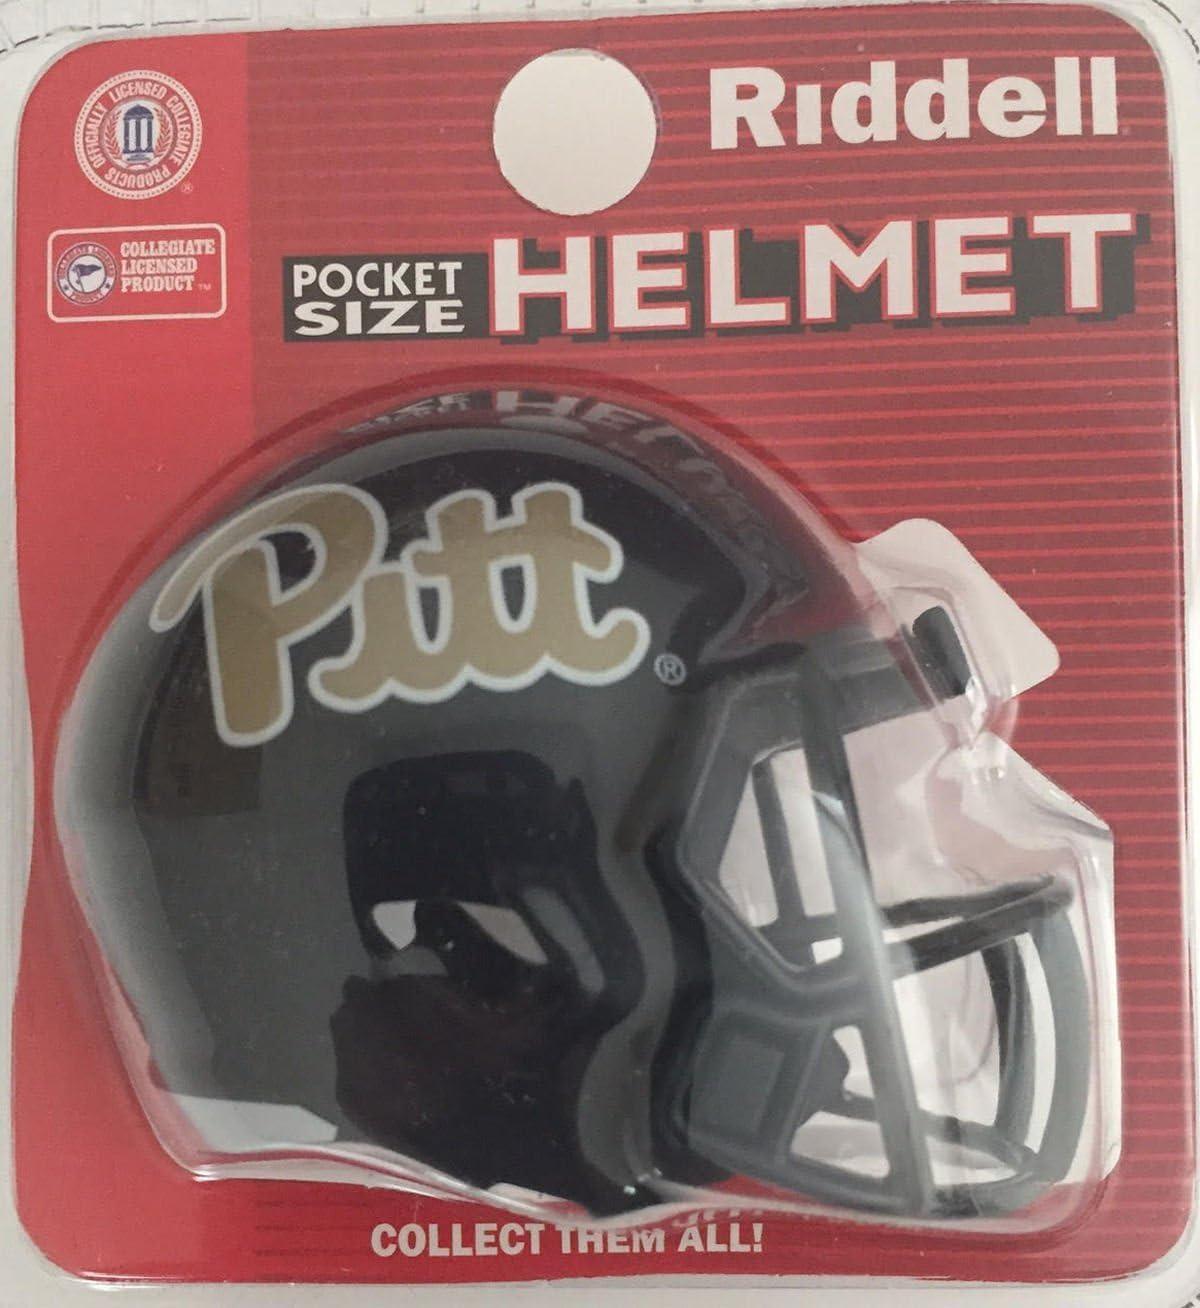 Riddell Pittsburg Pitt Panthers NCAA Football Helmet Christmas Tree DIY Ornament